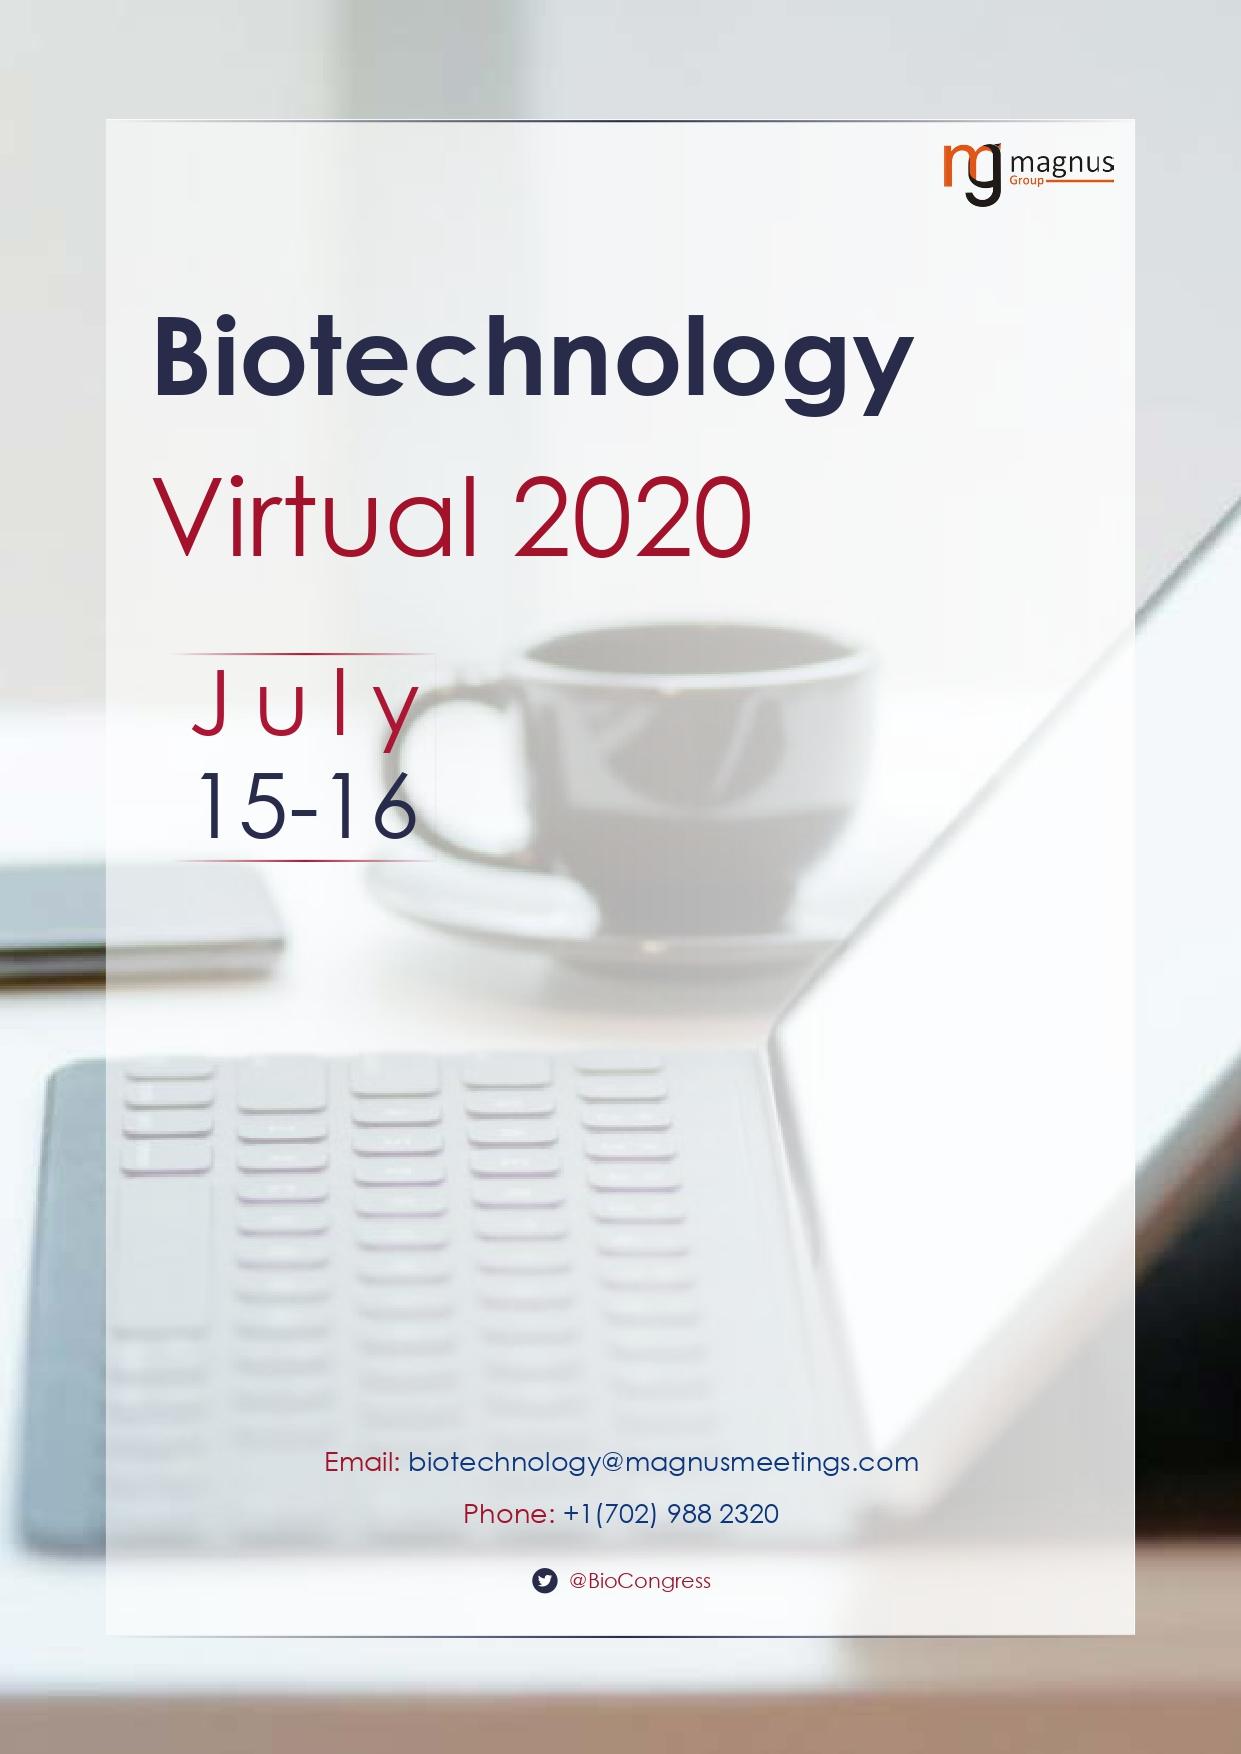 1st Edition of International Webinar on Biotechnology and Bioenginering | Online Event Book